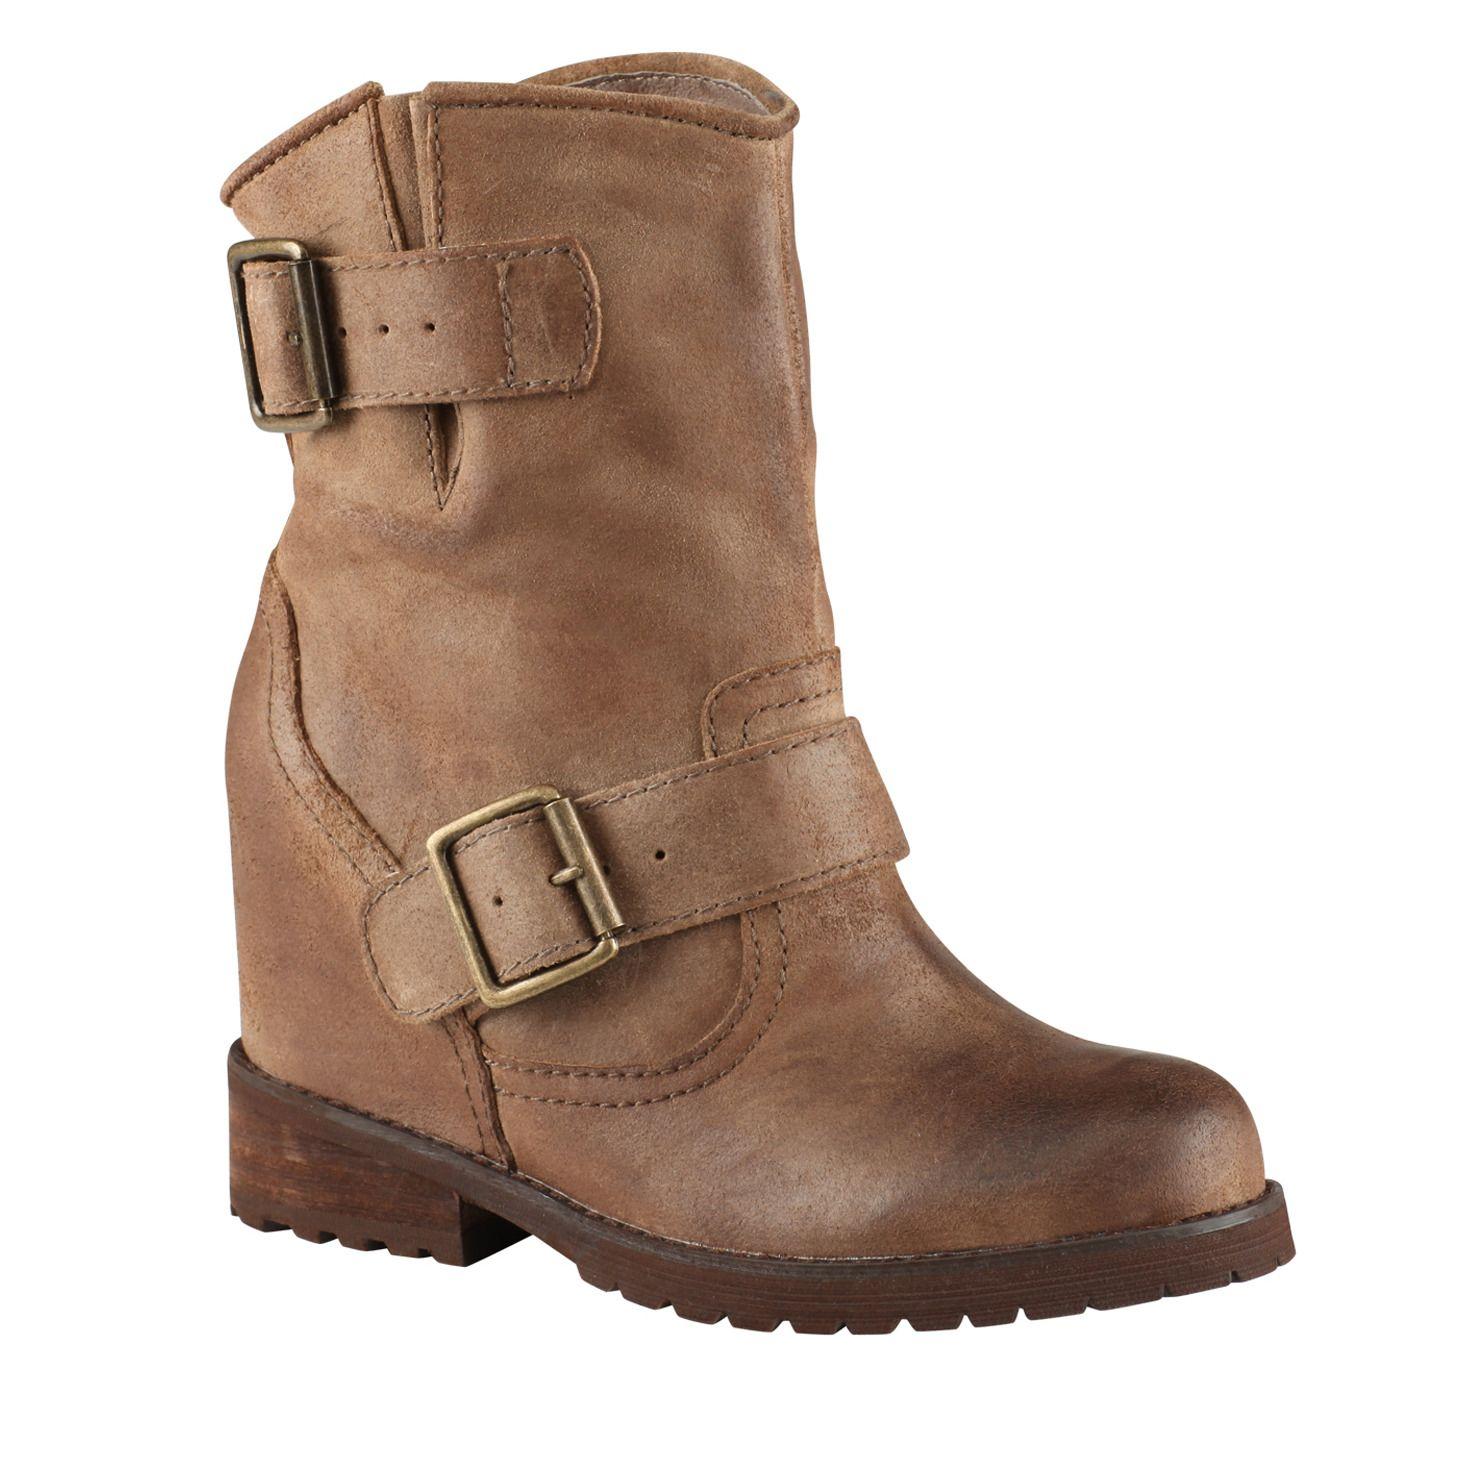 KOTEK - women's mid boots boots for sale at ALDO